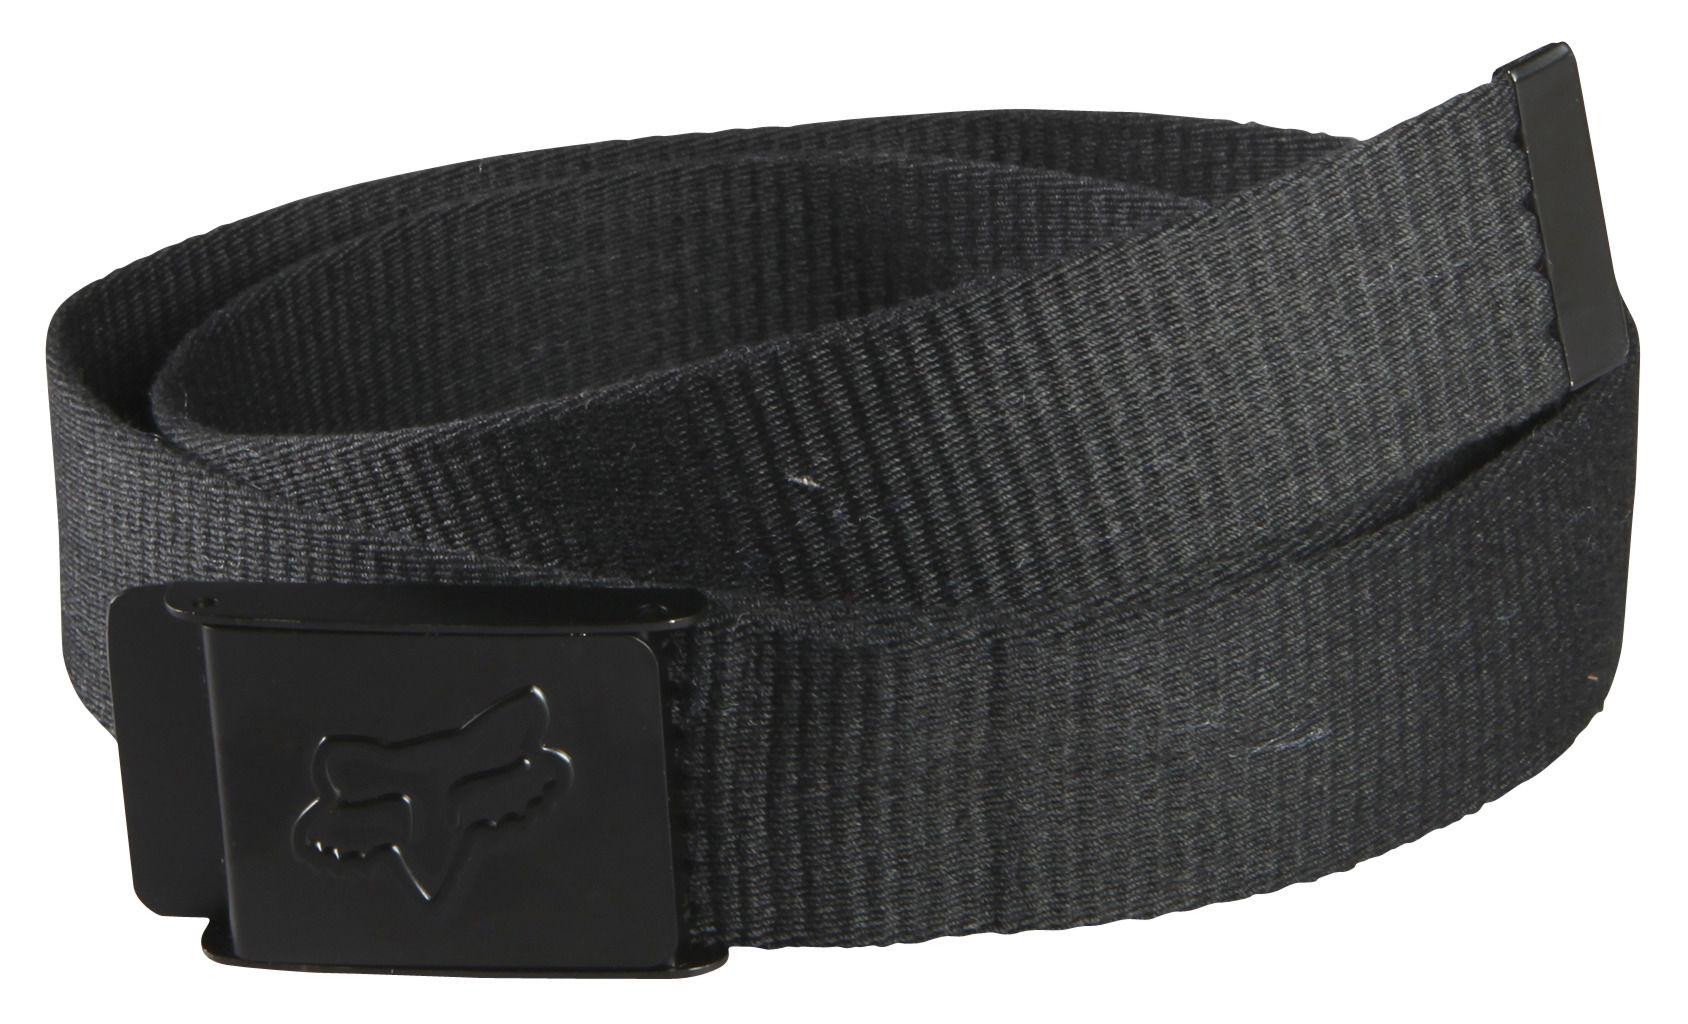 cinto fox mr. clean web belt negro